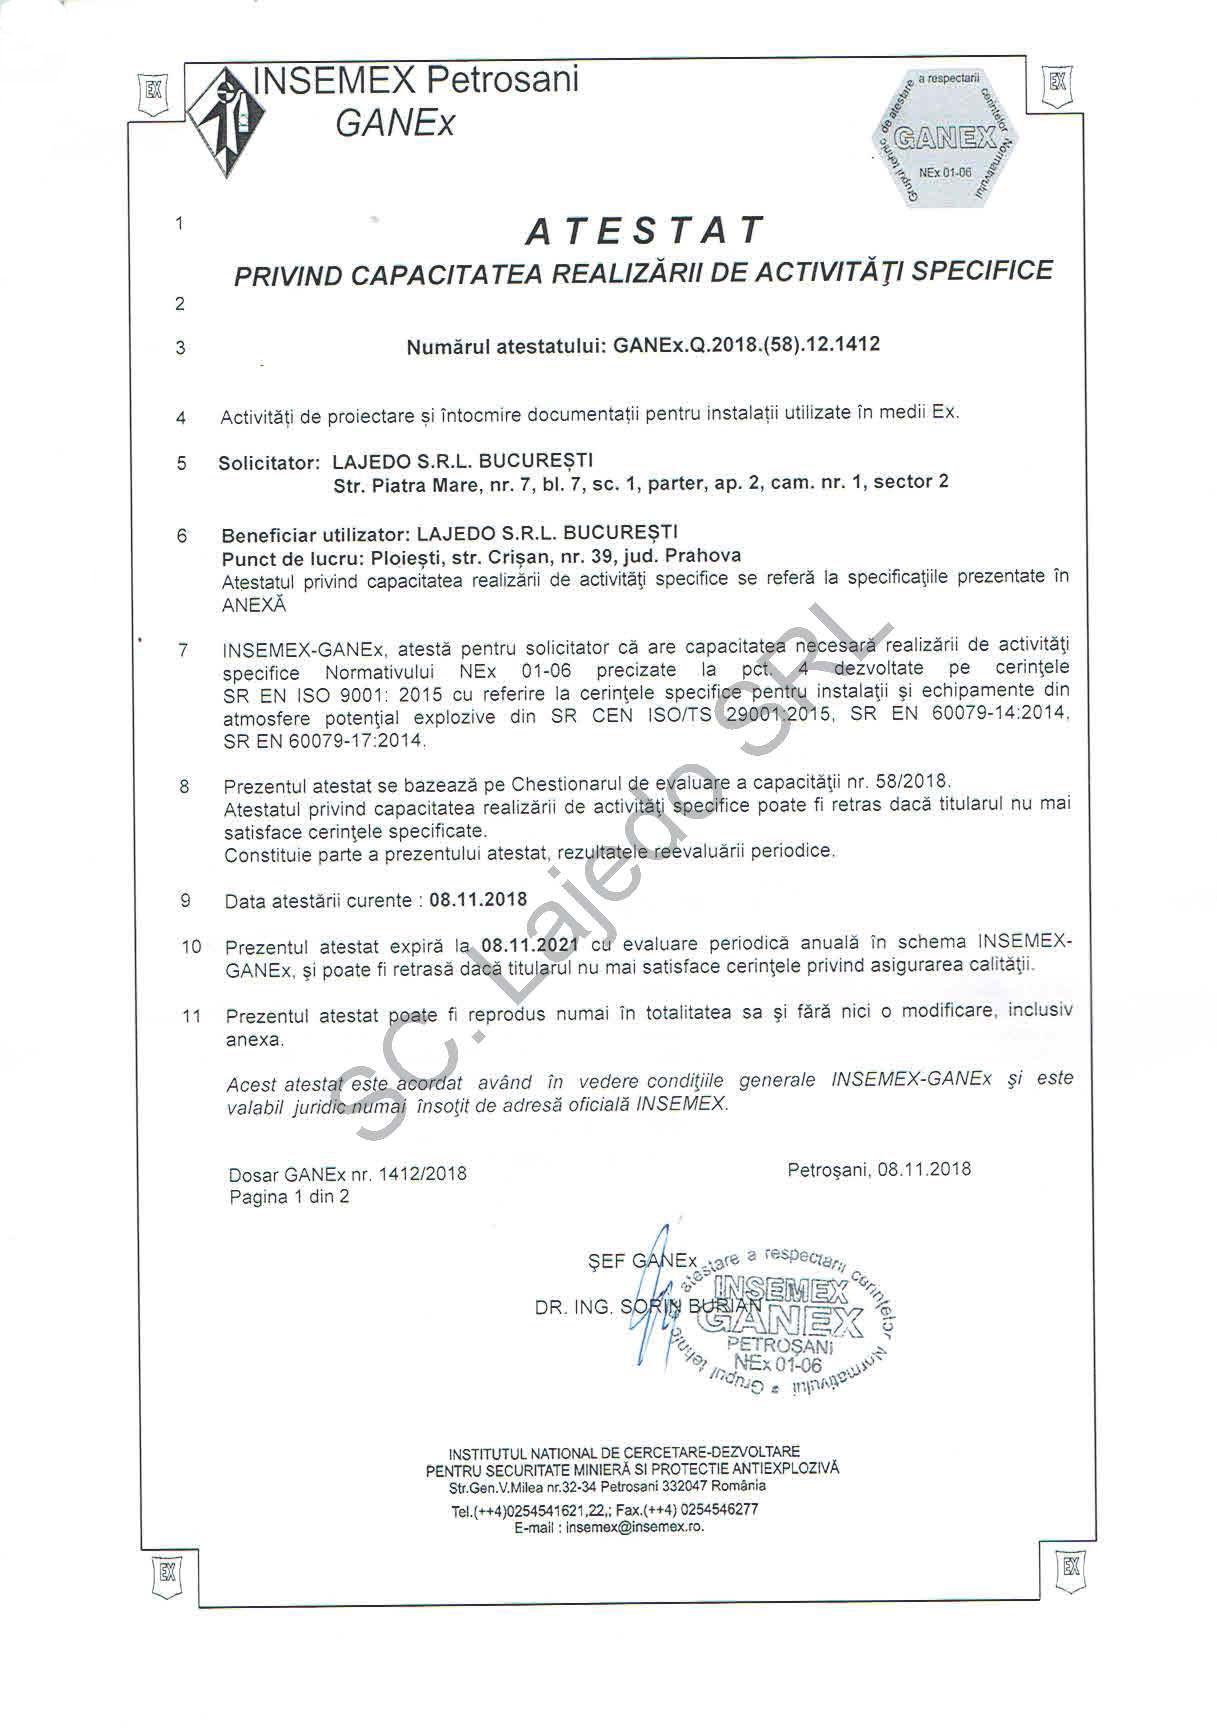 Atestat INSEMEX-GANEx